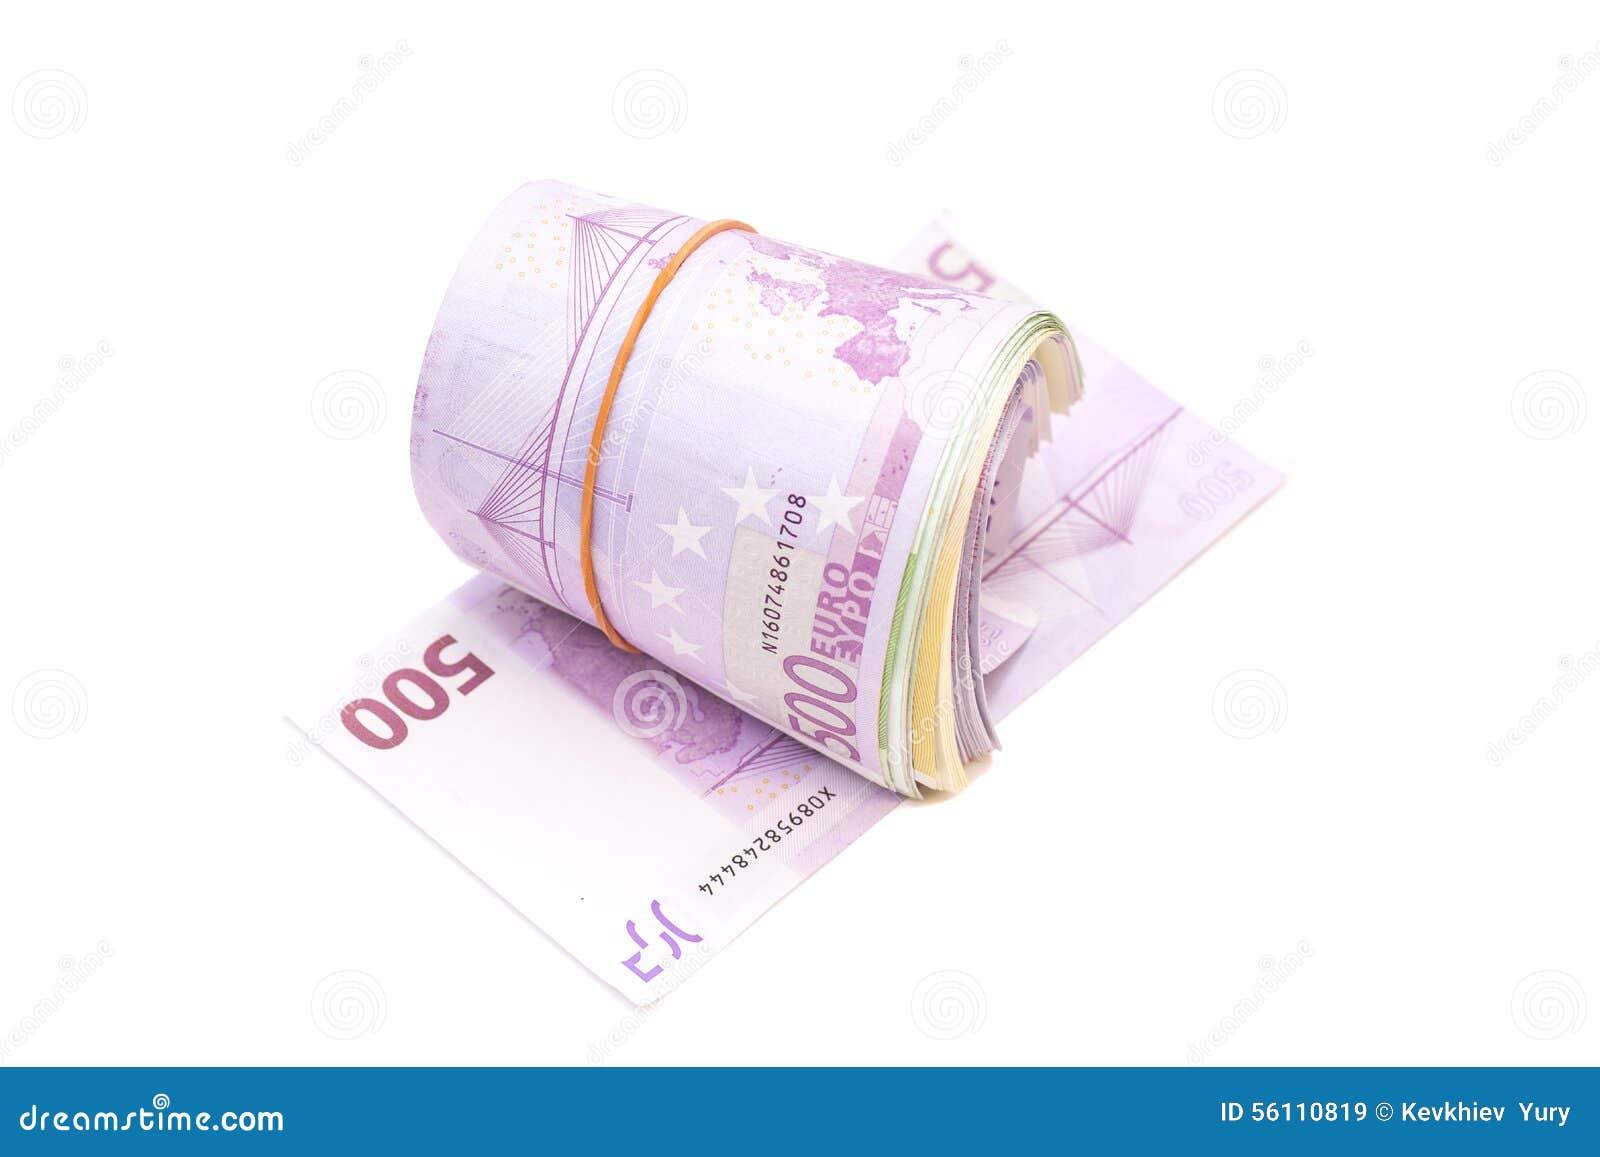 Fünf Hundertstel Banknoten unter Gummiband